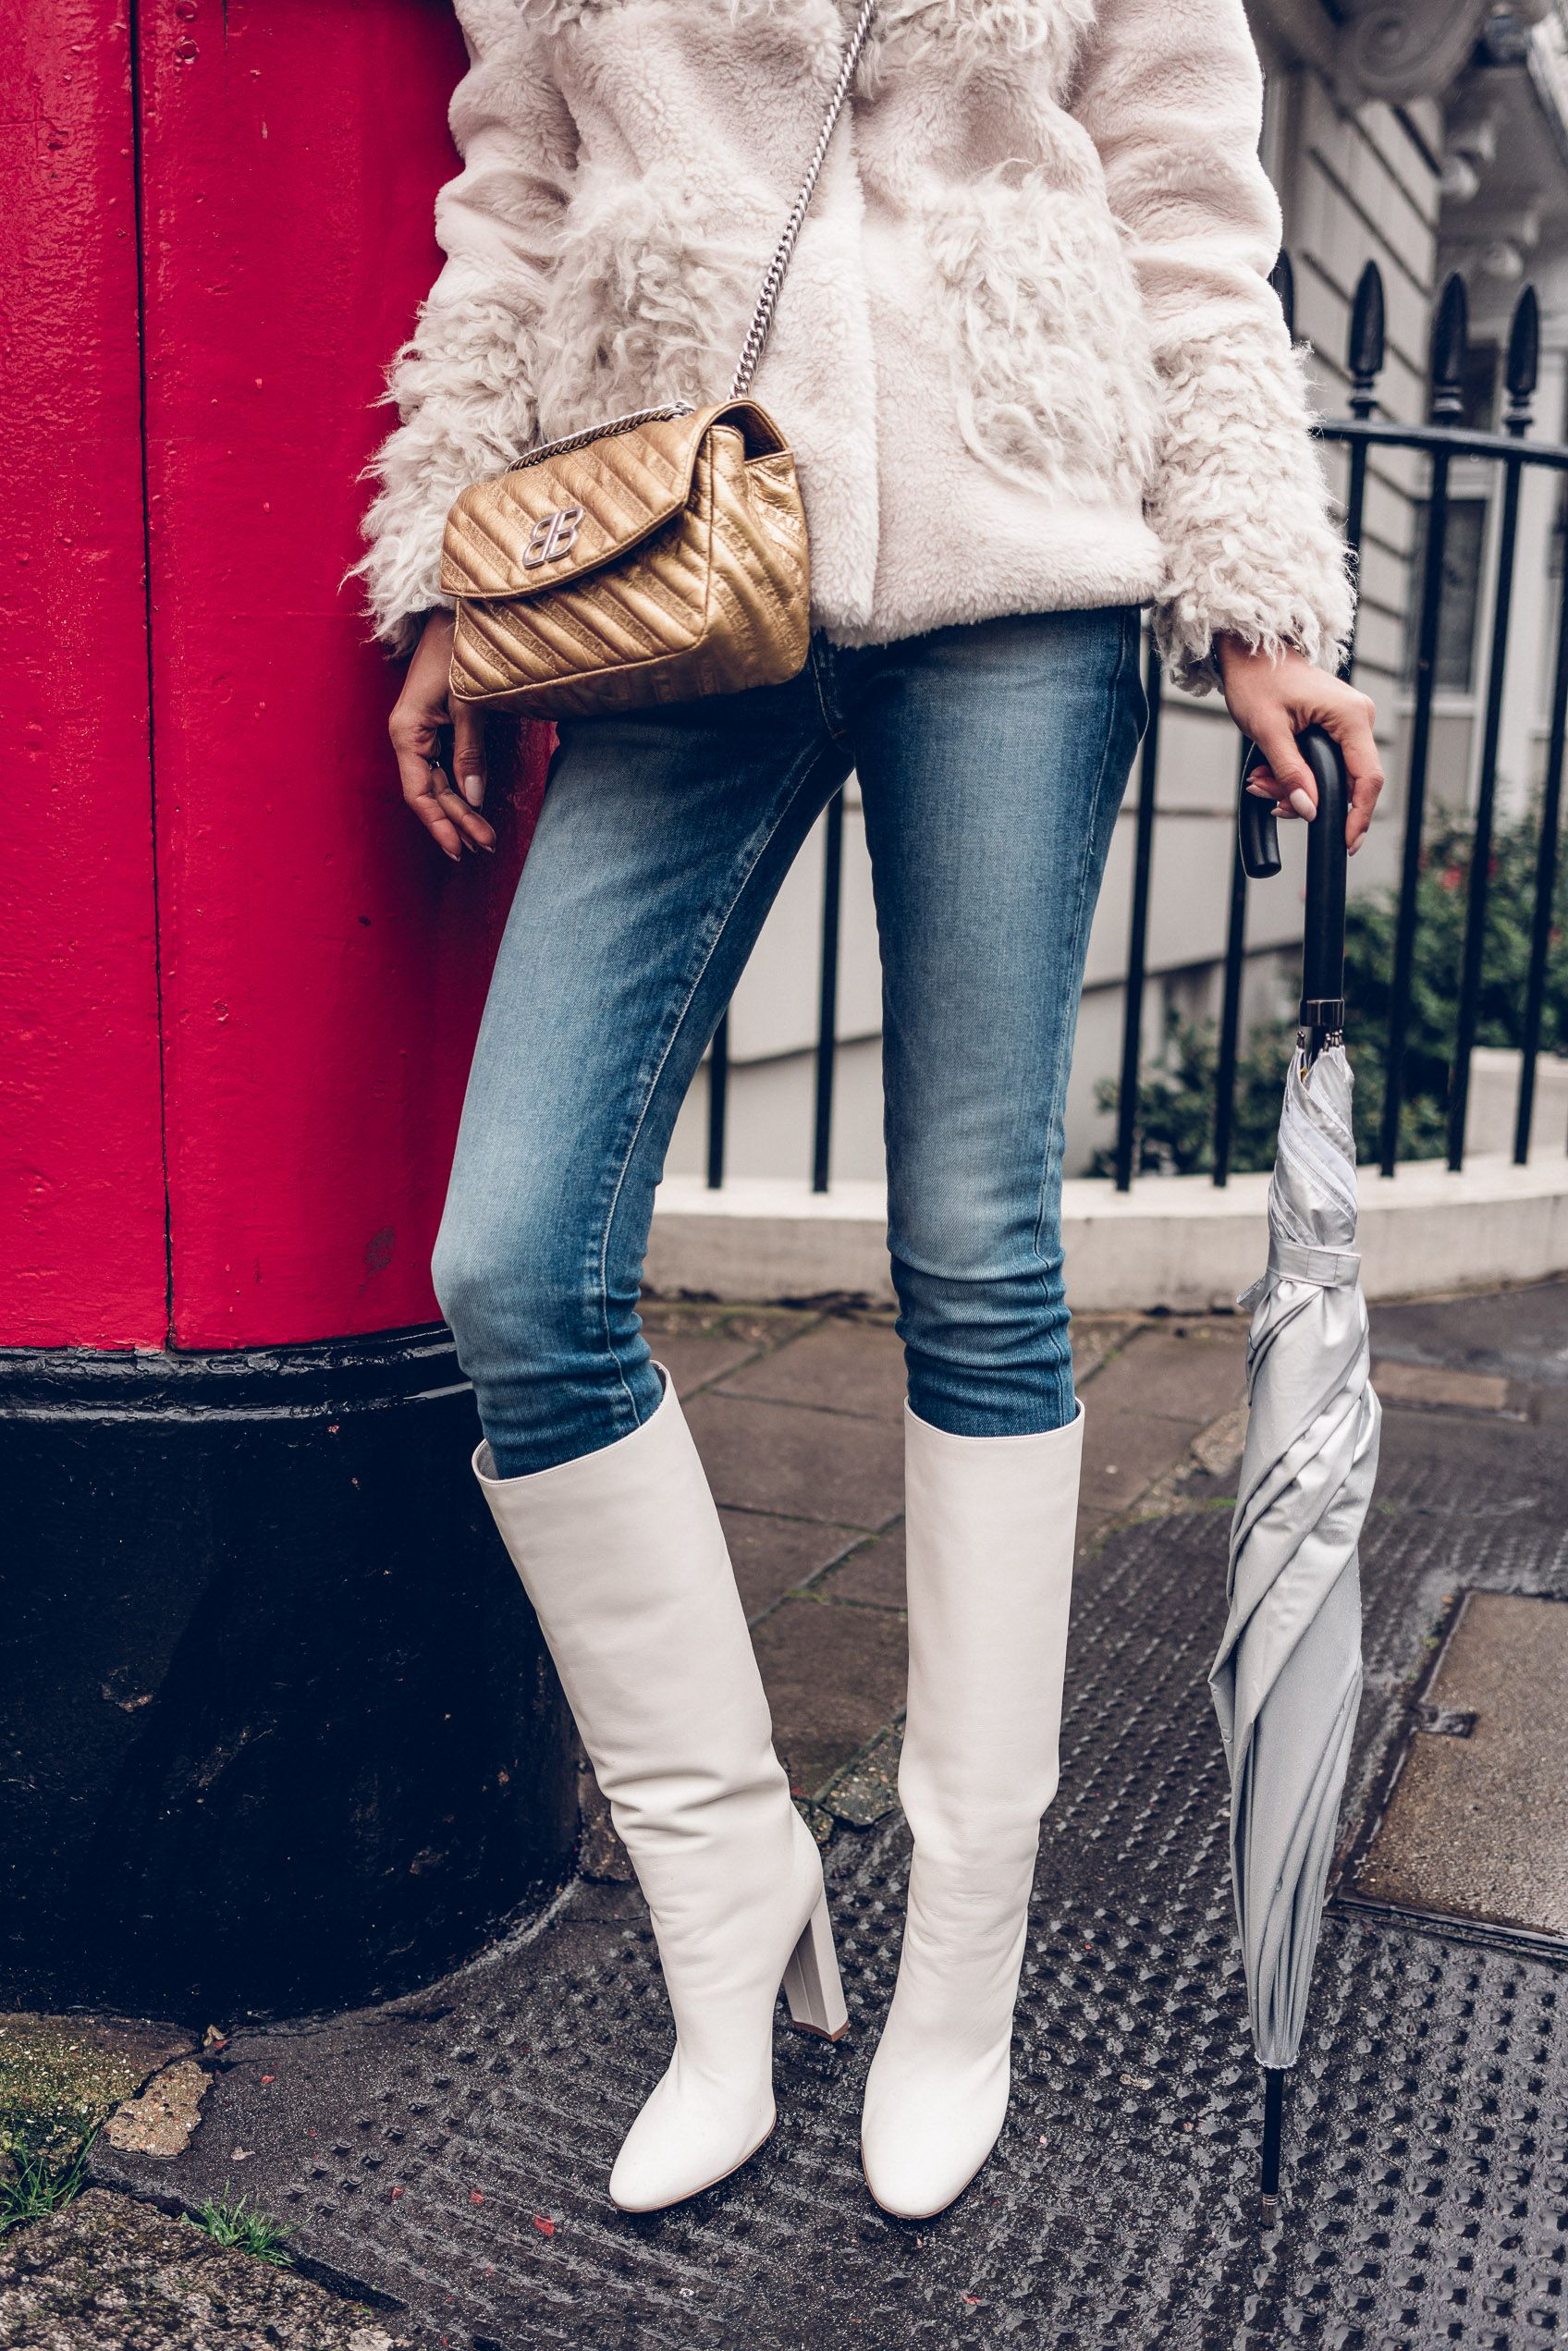 flache weiße overknee stiefel